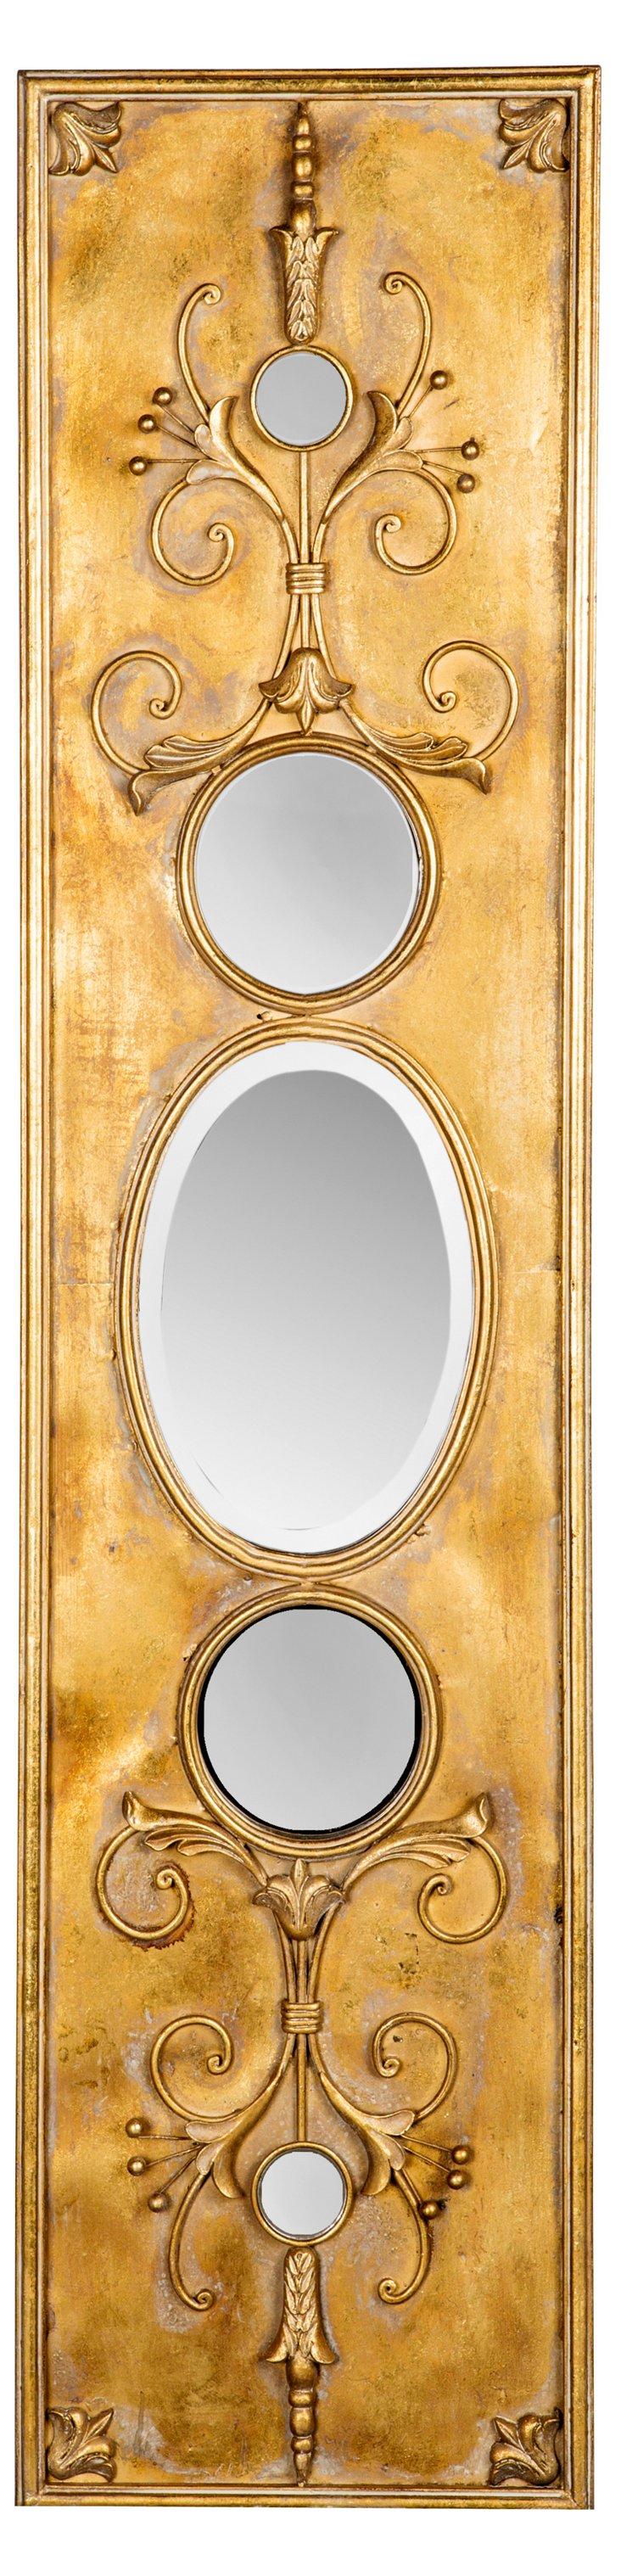 Marabelle Oversize Mirror, Gold